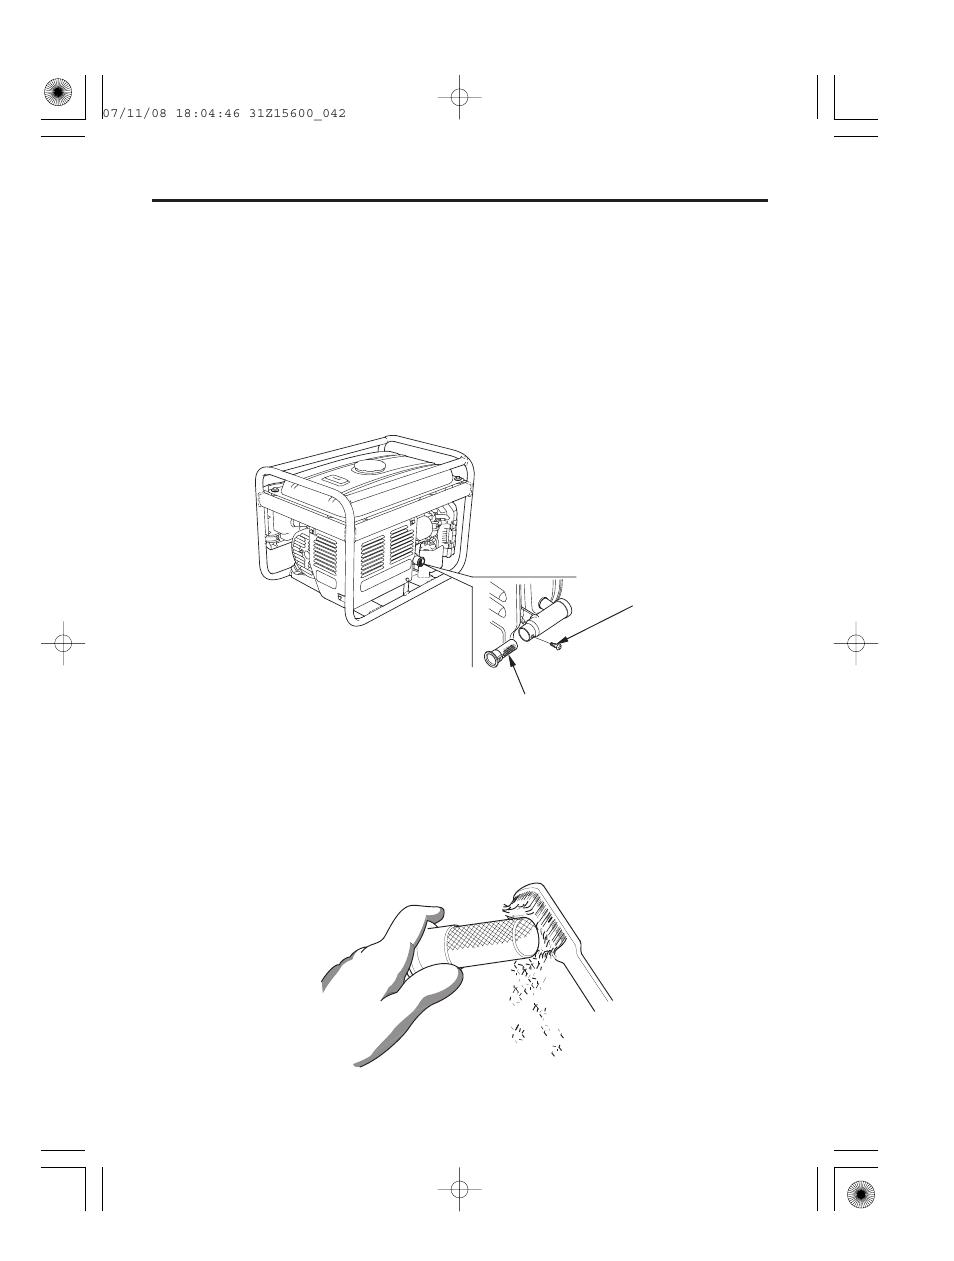 Spark arrester service, 41 servicing your generator | HONDA EP2500CX User  Manual | Page 43